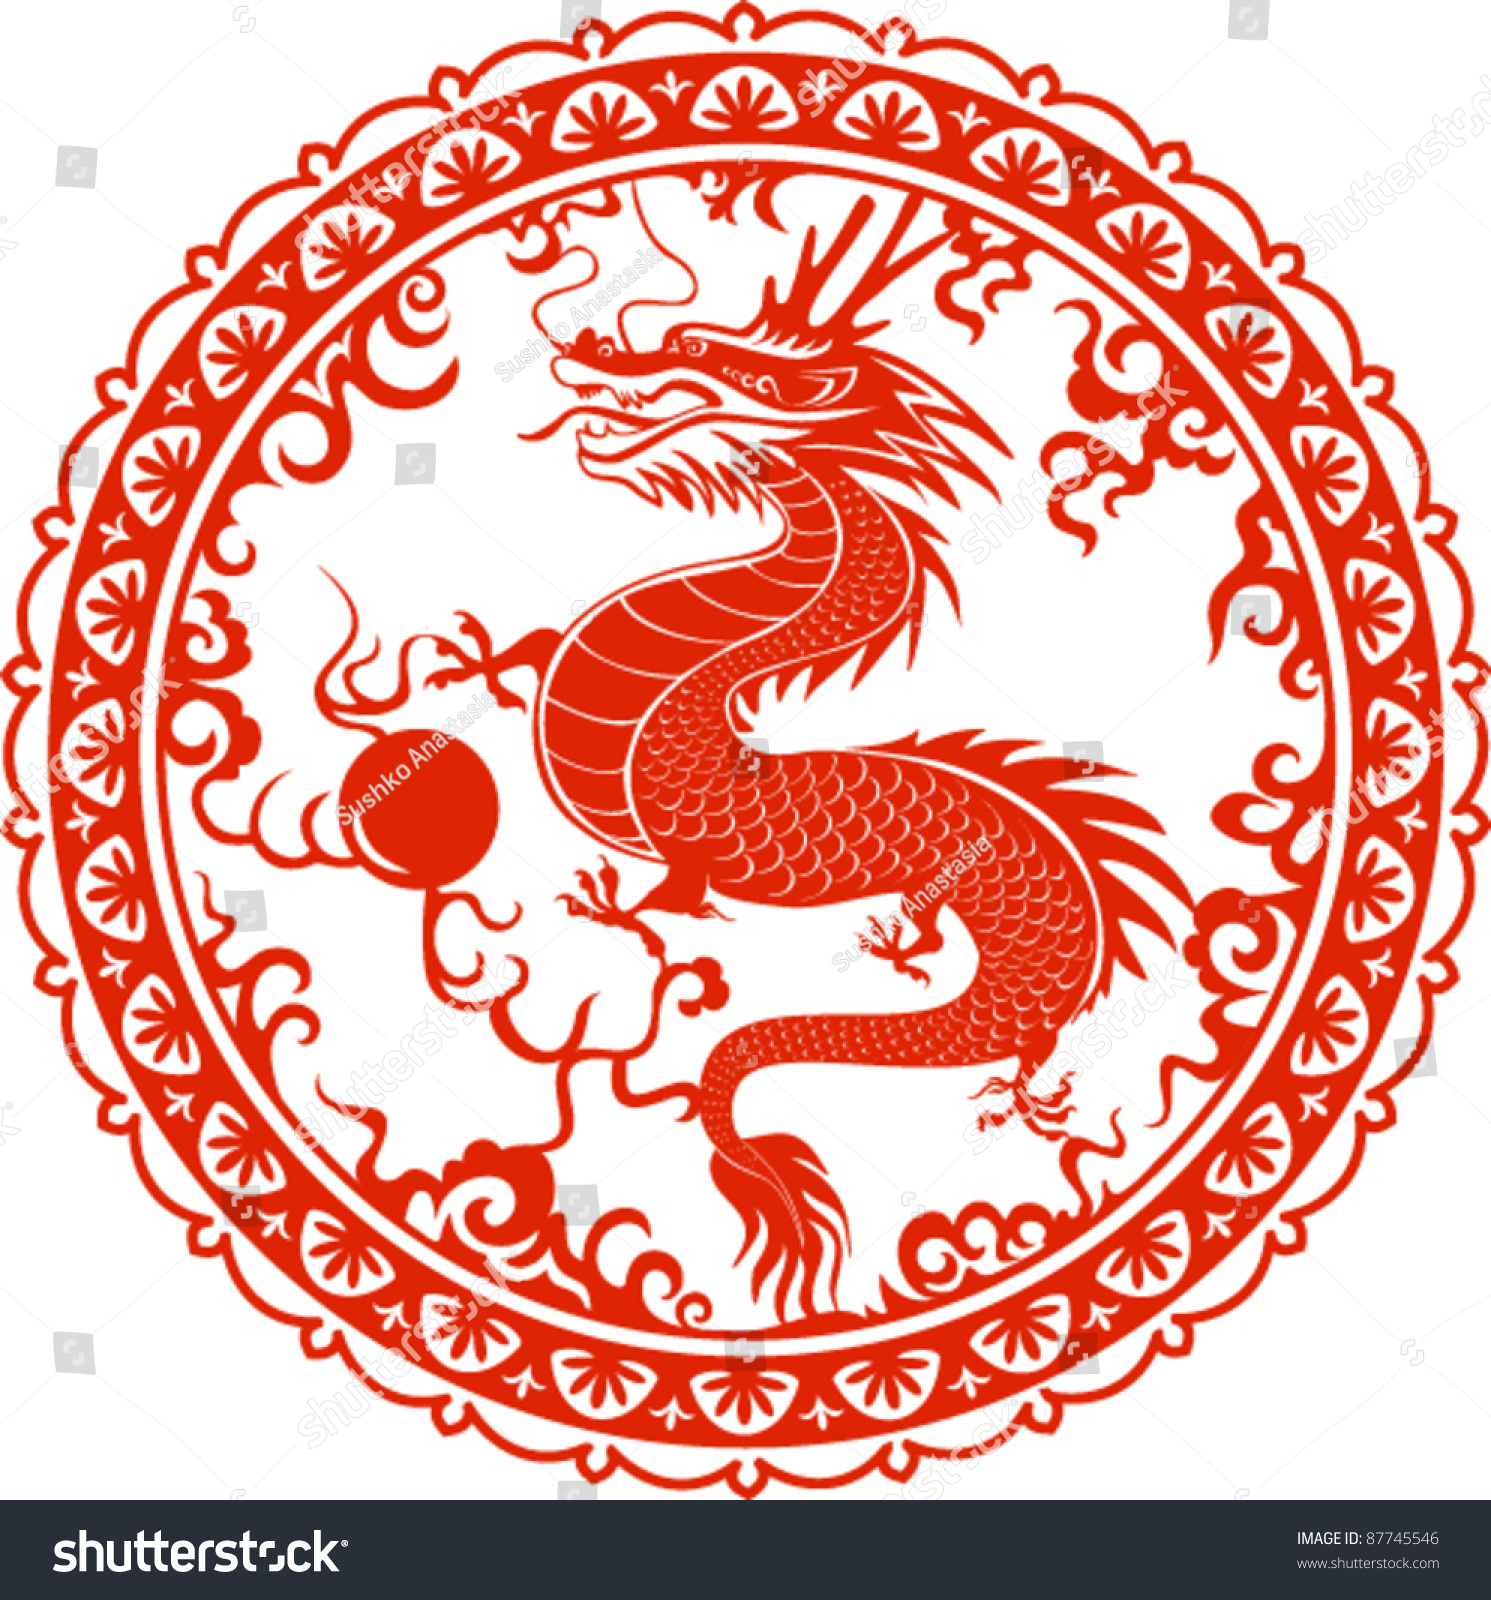 http://image.shutterstock.com/z/stock-vector-dragon-year-chinese-zodiac-87745546.jpg